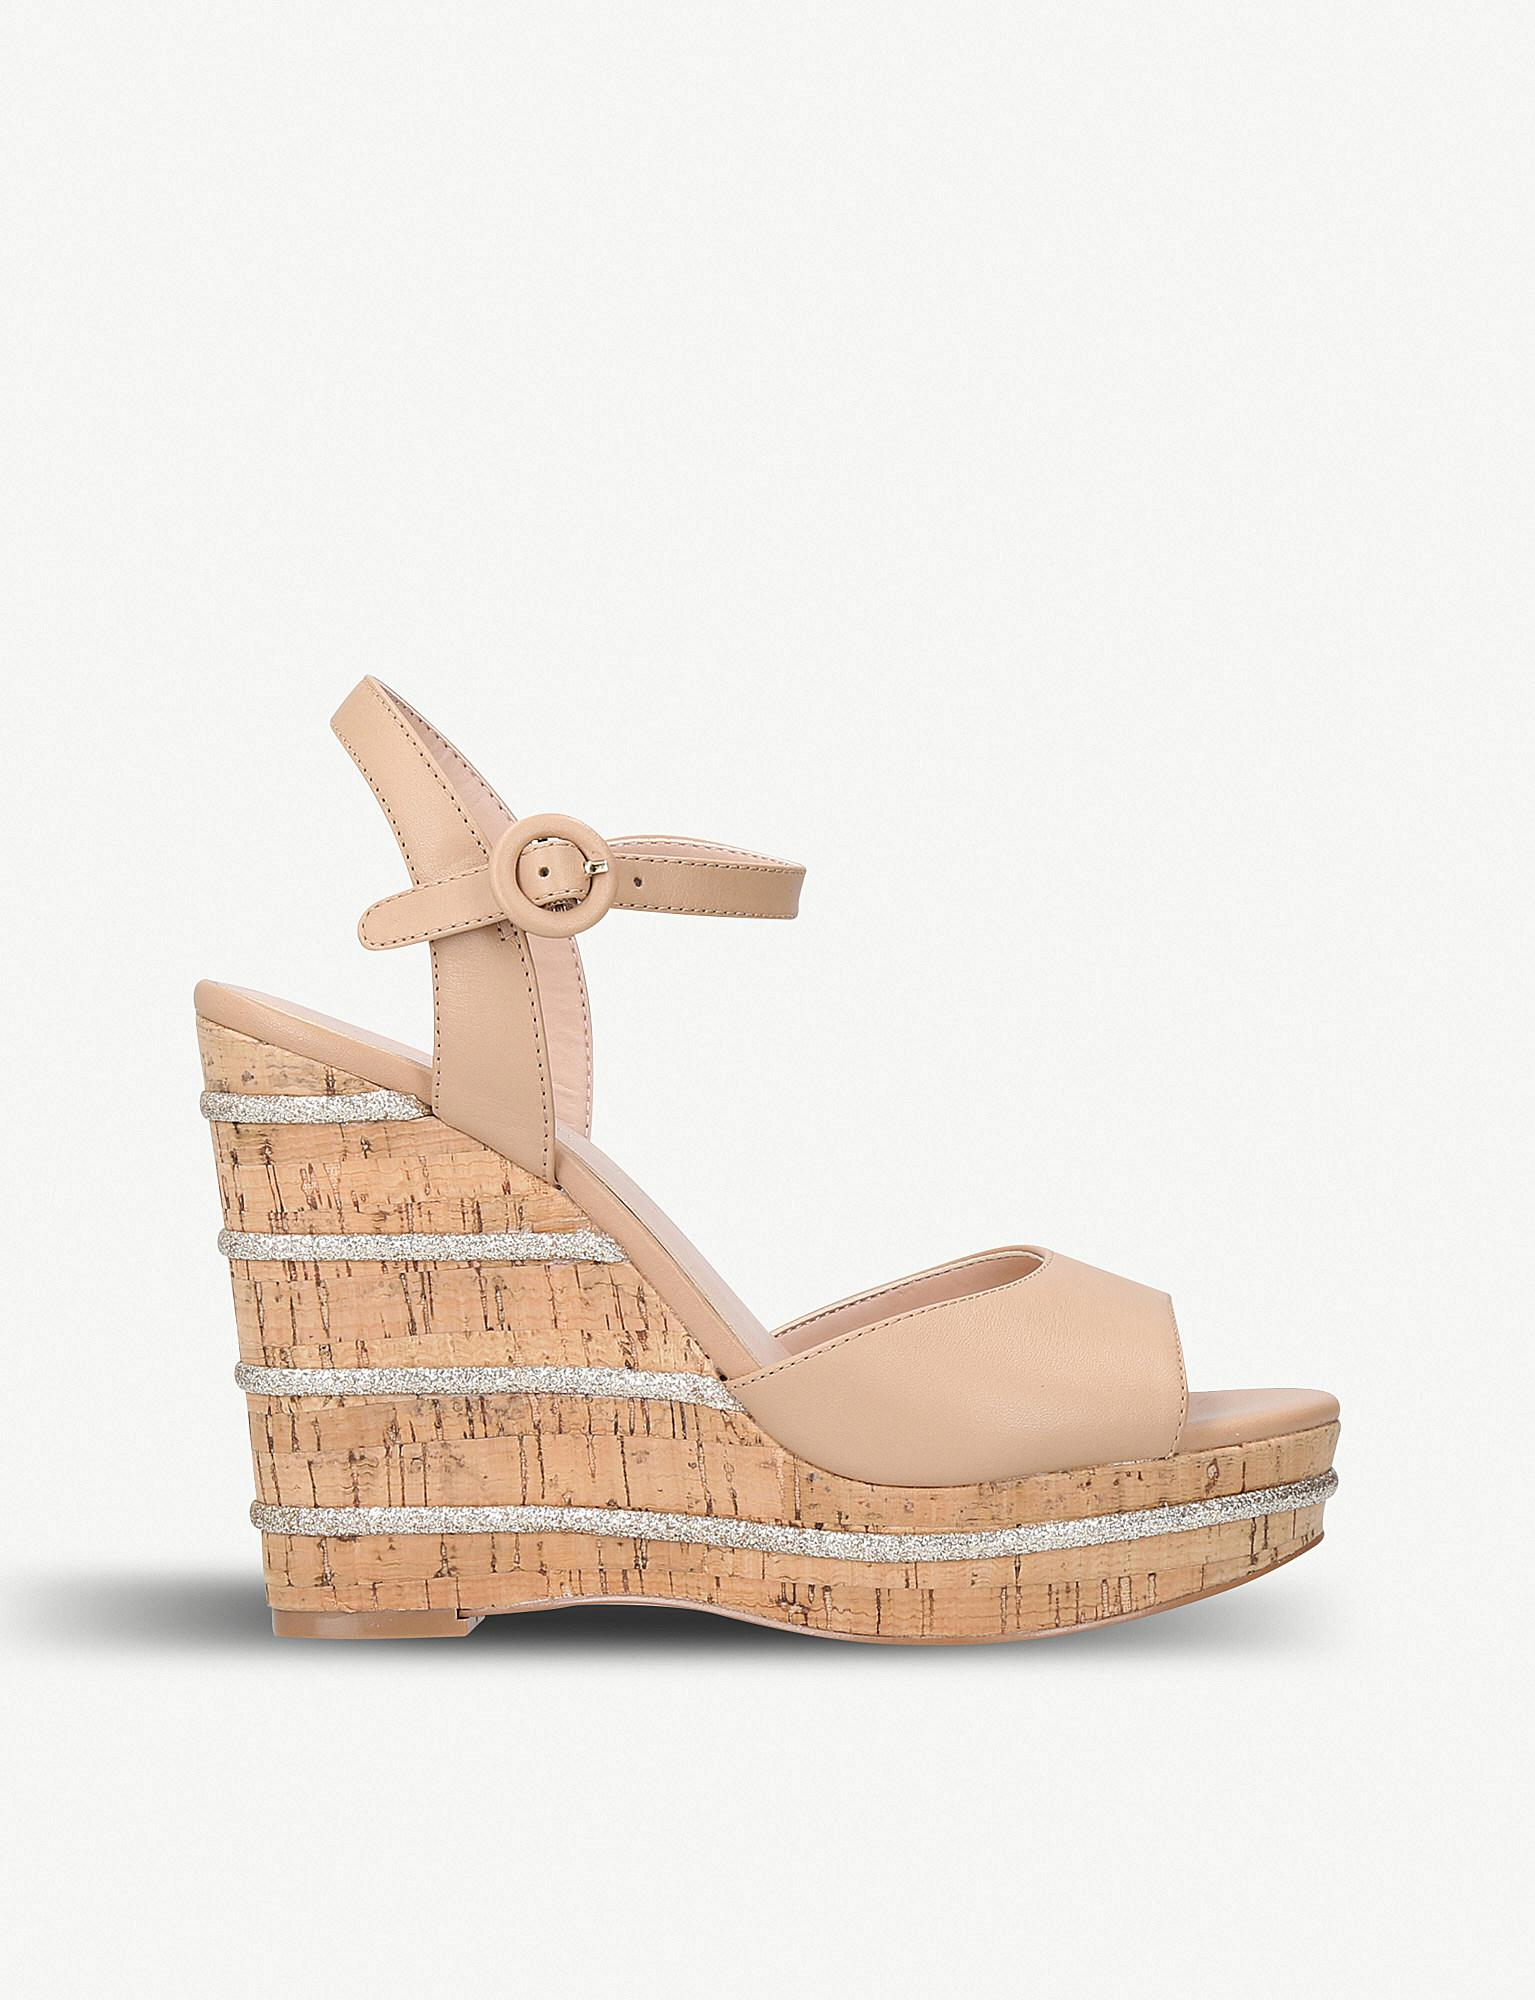 Buy Online Cheap Get To Buy For Sale Kurt Geiger Ally Wedge Heel Sandals lVMqwsh